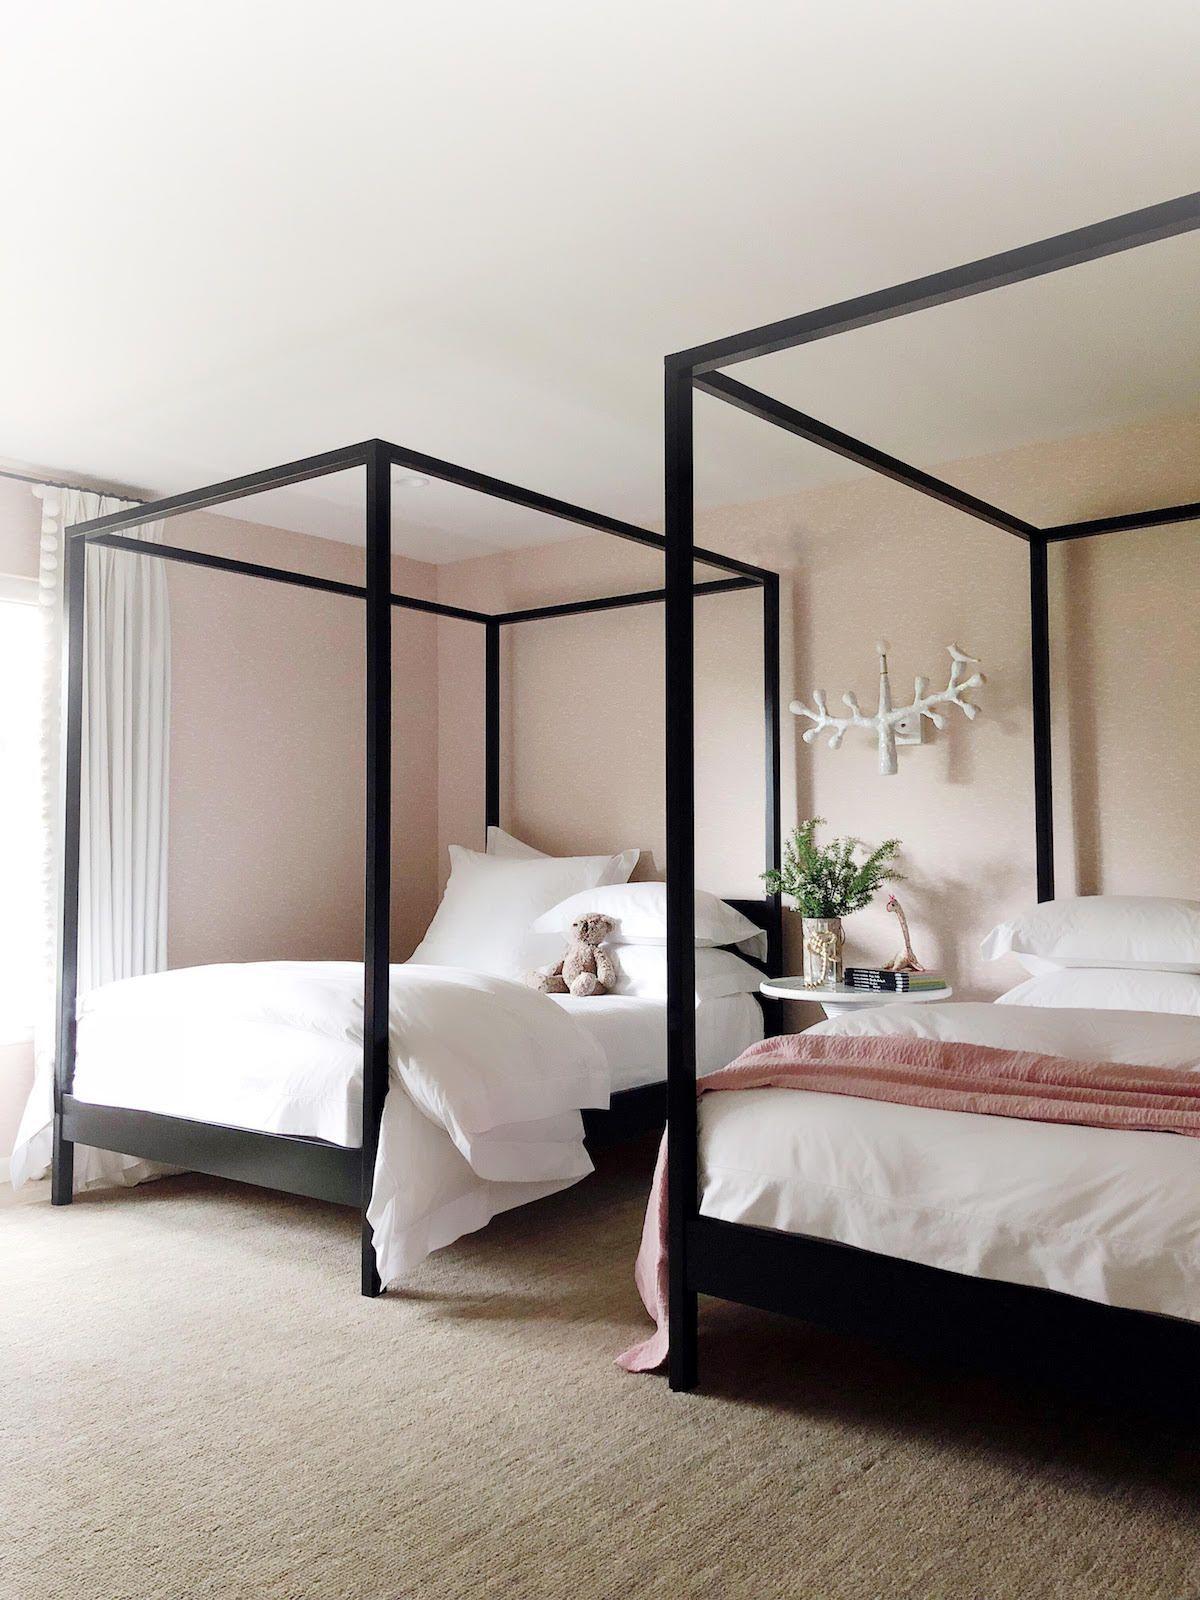 Cabana Canopy Bed No Footboard Baby Room Twin Canopy Bed Black Canopy Beds Canopy Bedroom Sets